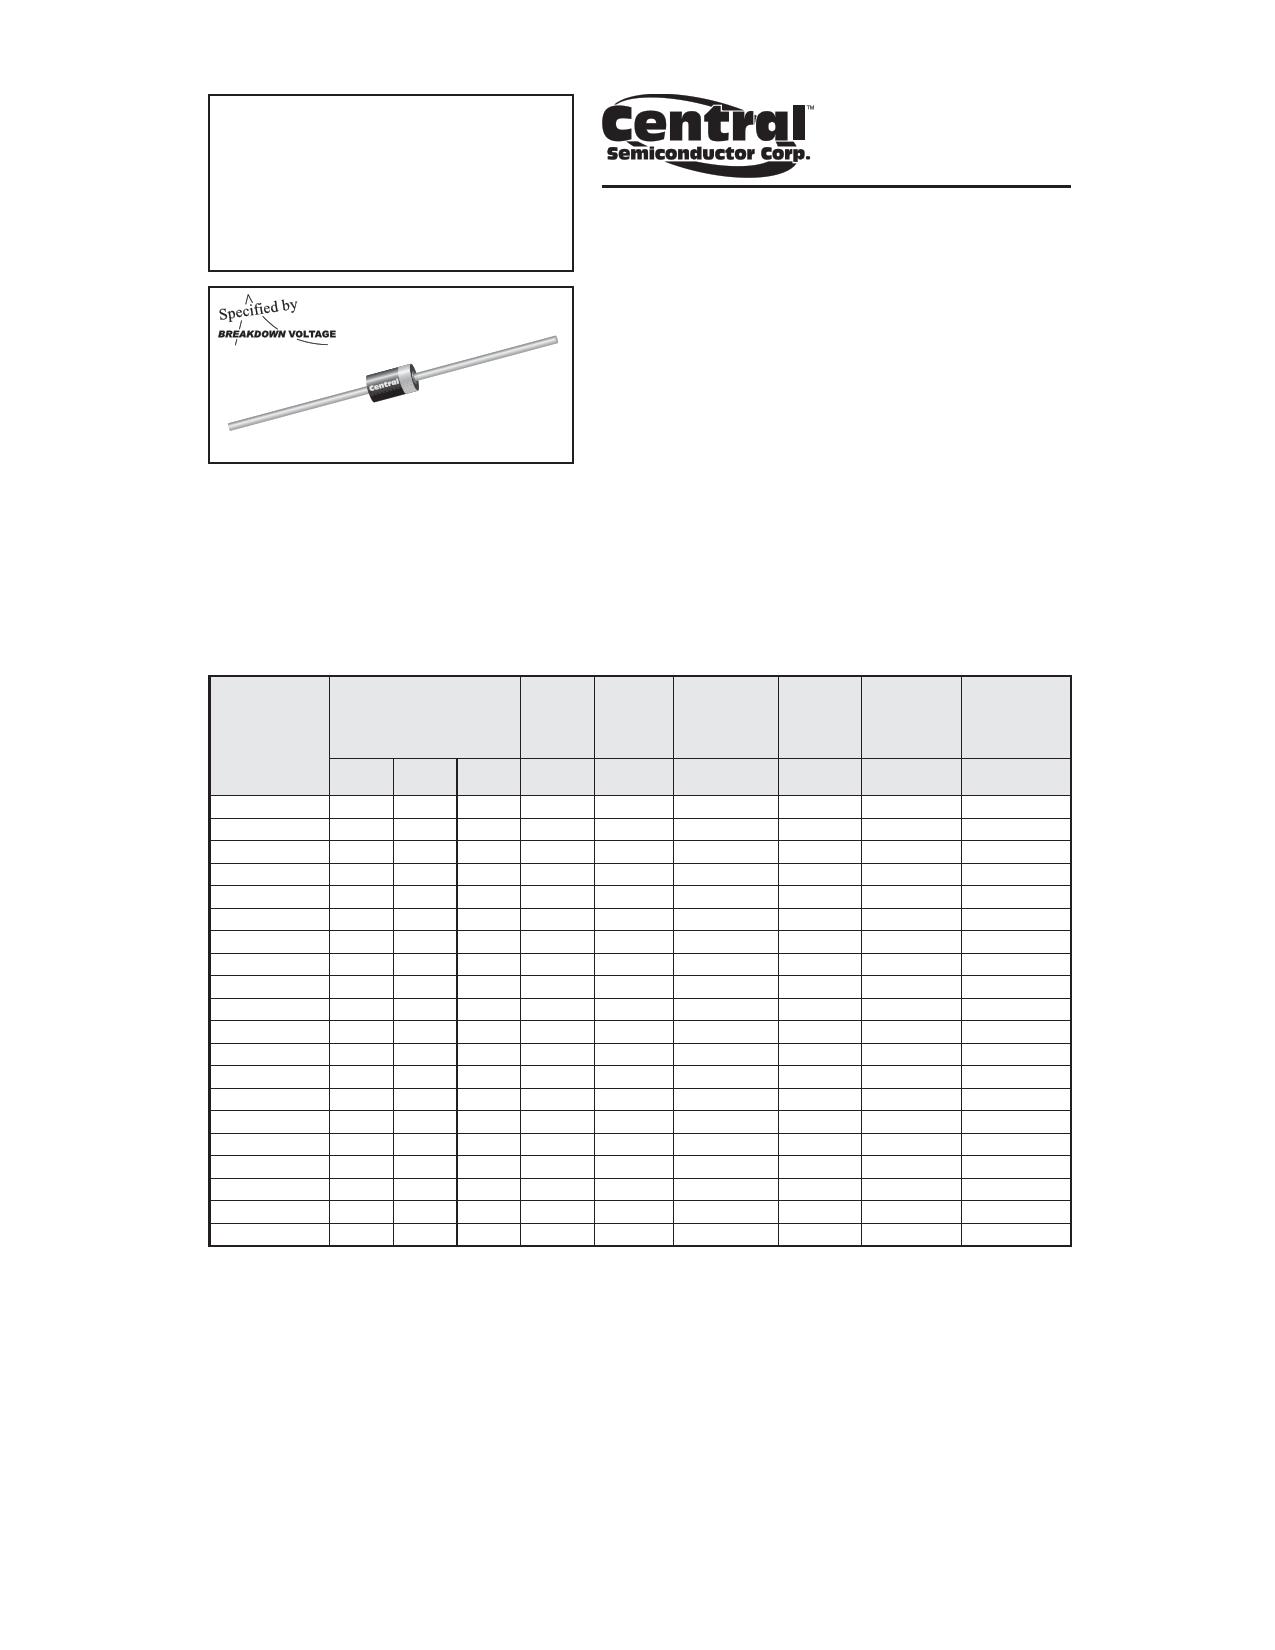 1.5CE62A datasheet